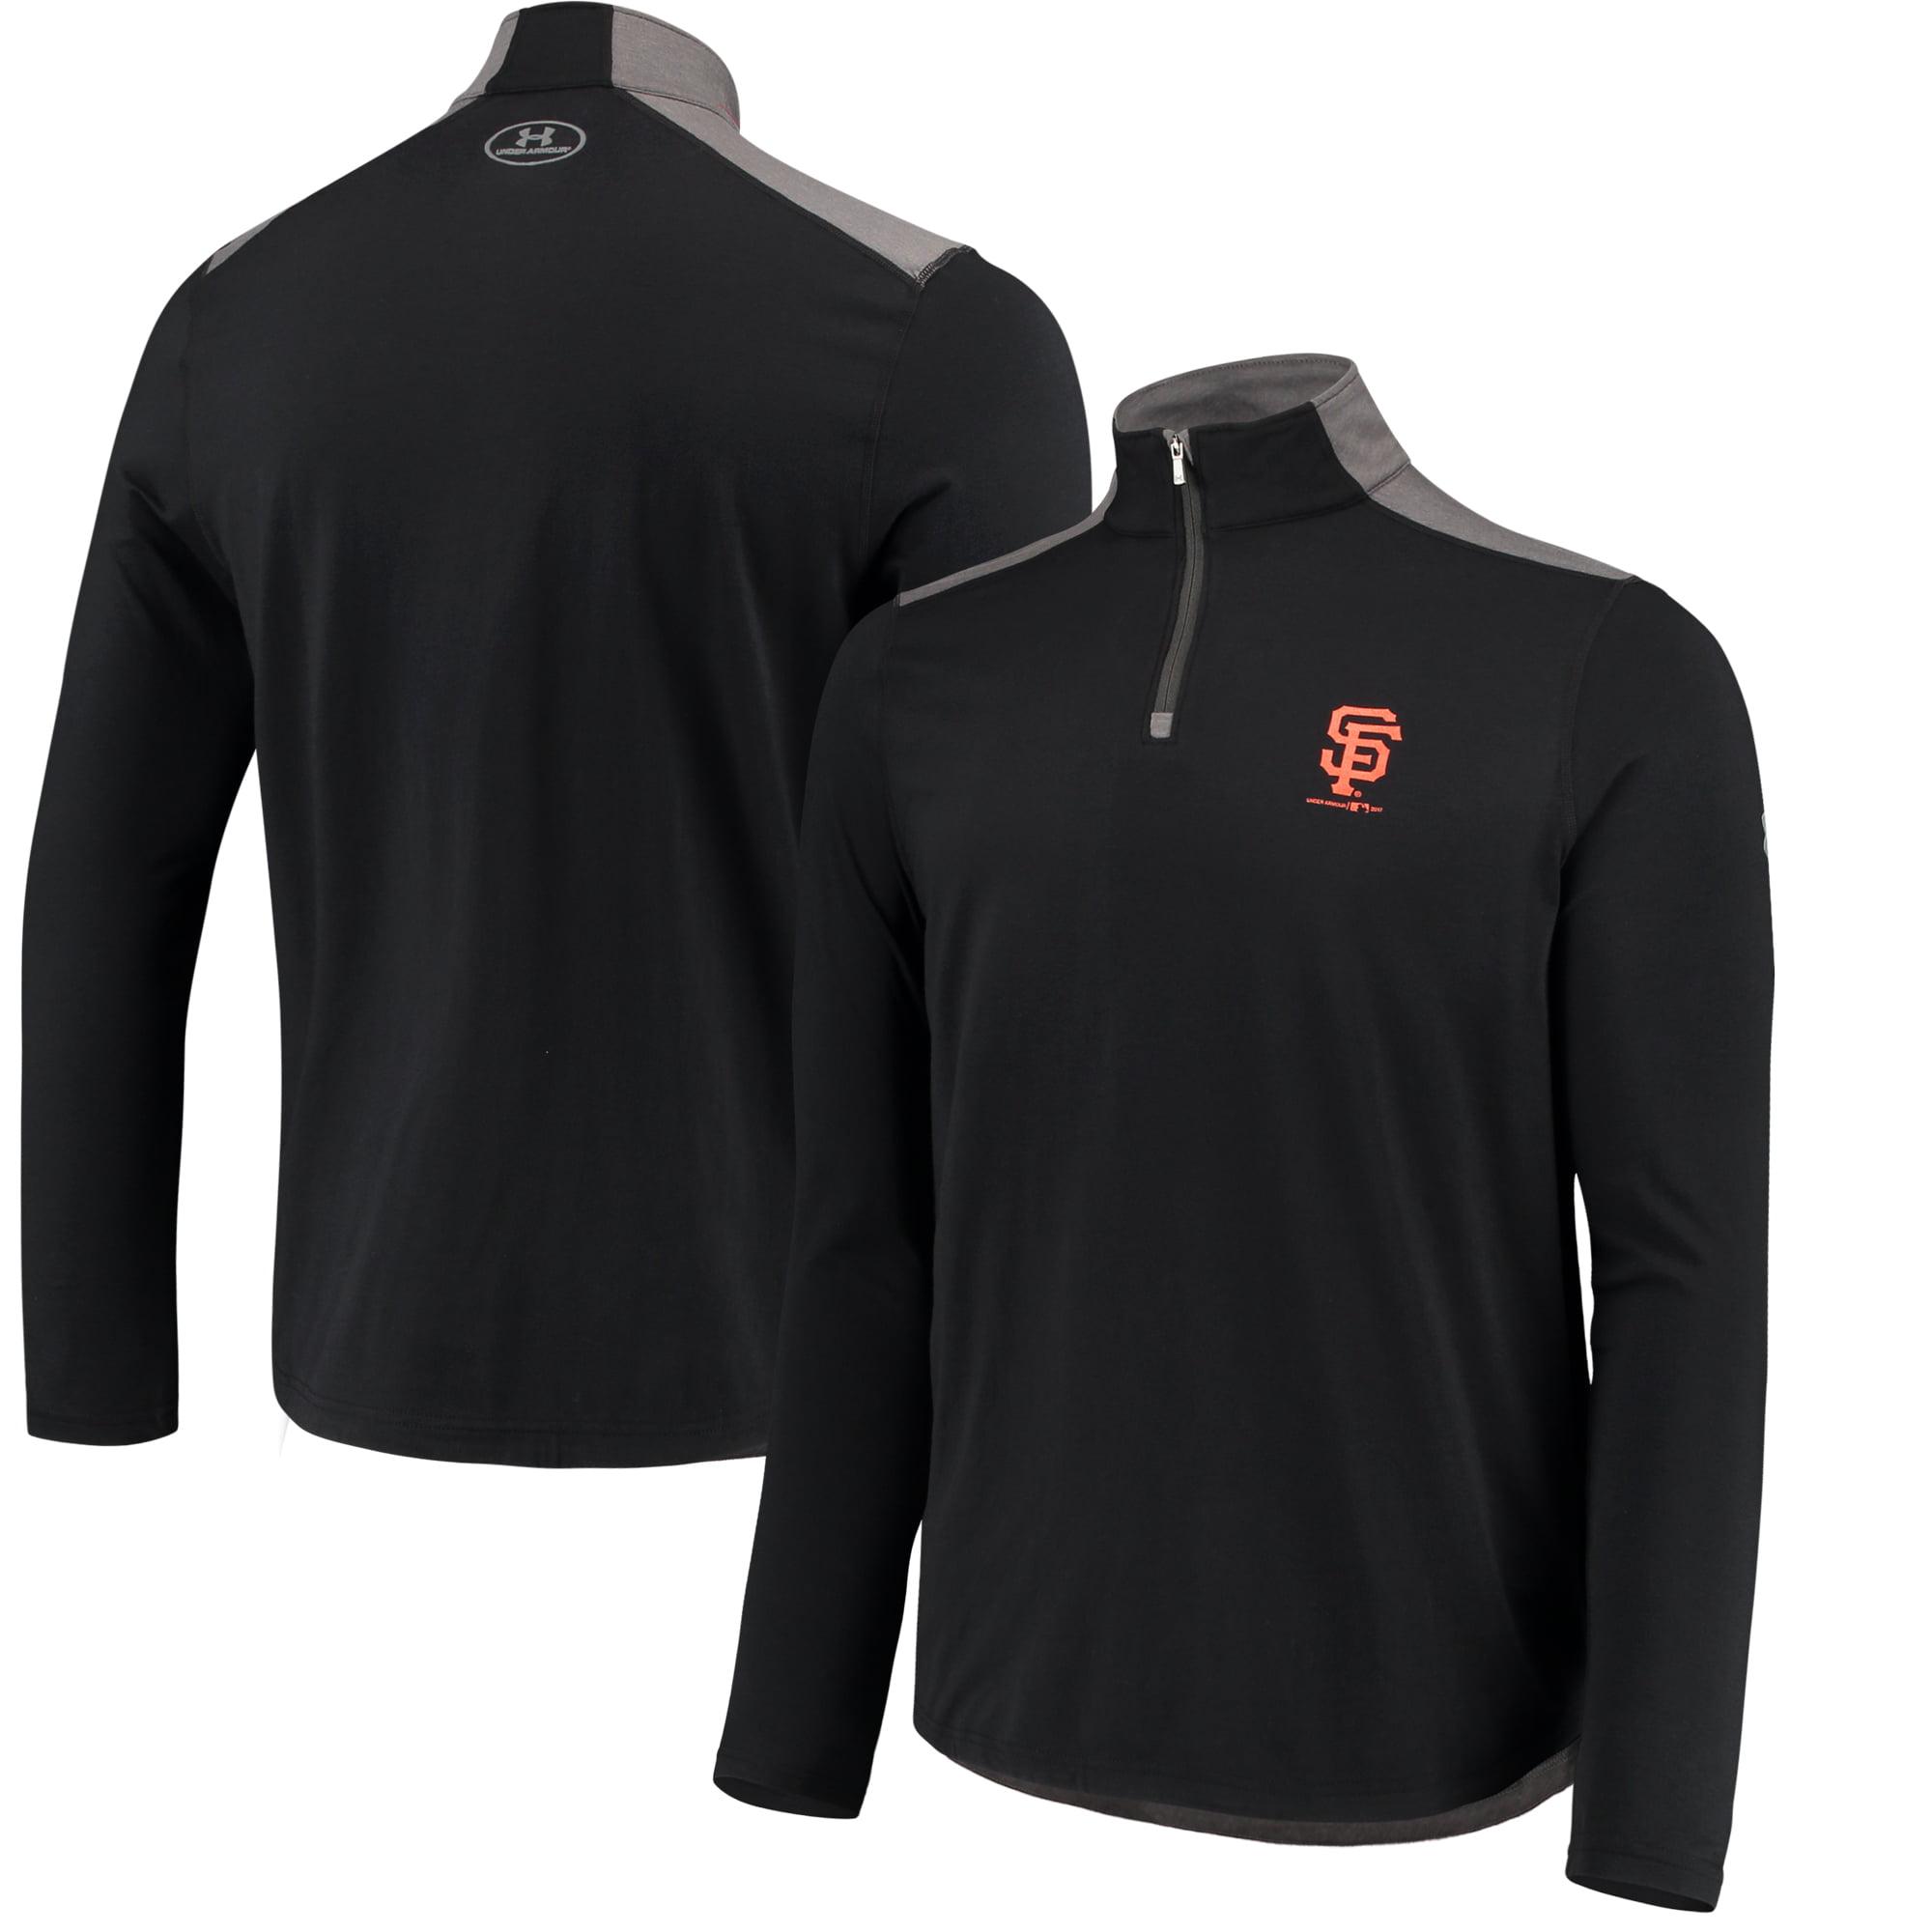 Men's Under Armour Black San Francisco Giants Charged Cotton Quarter-Zip Pullover Jacket